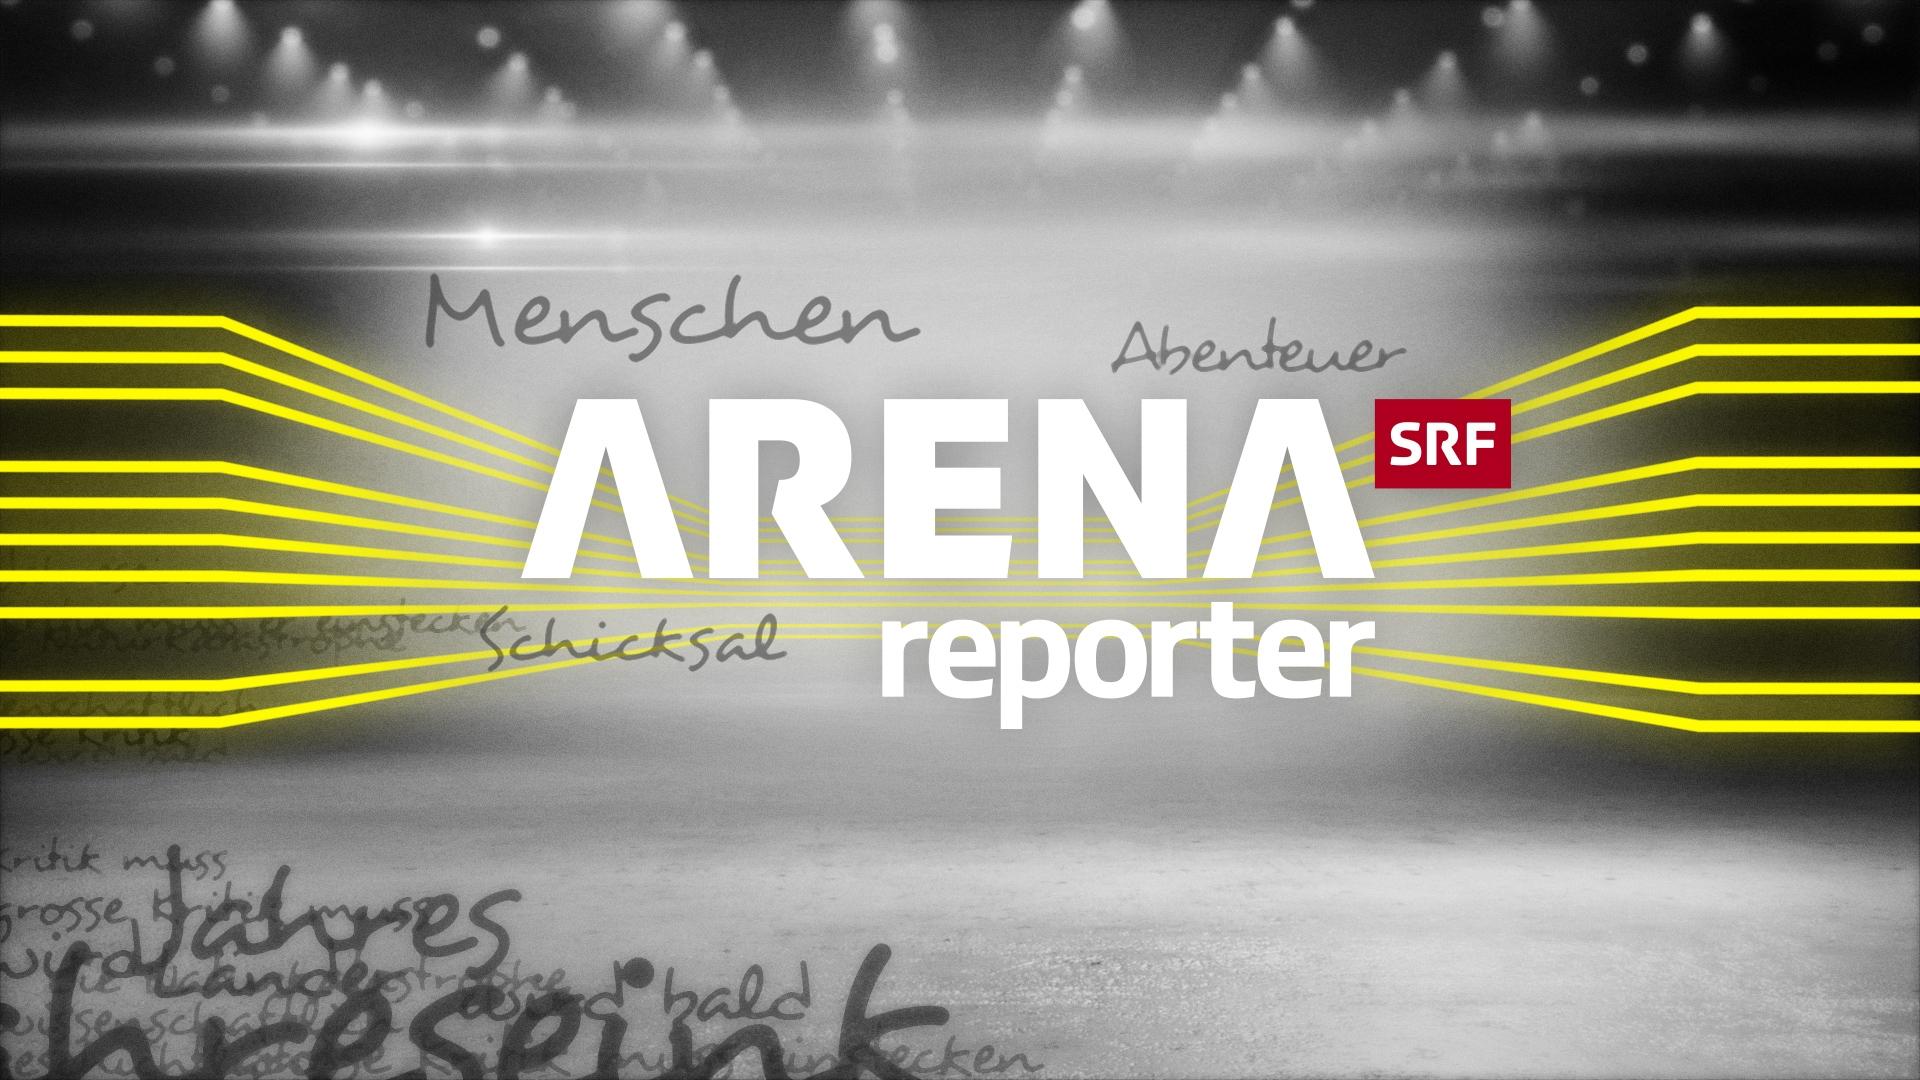 Arena Reporter